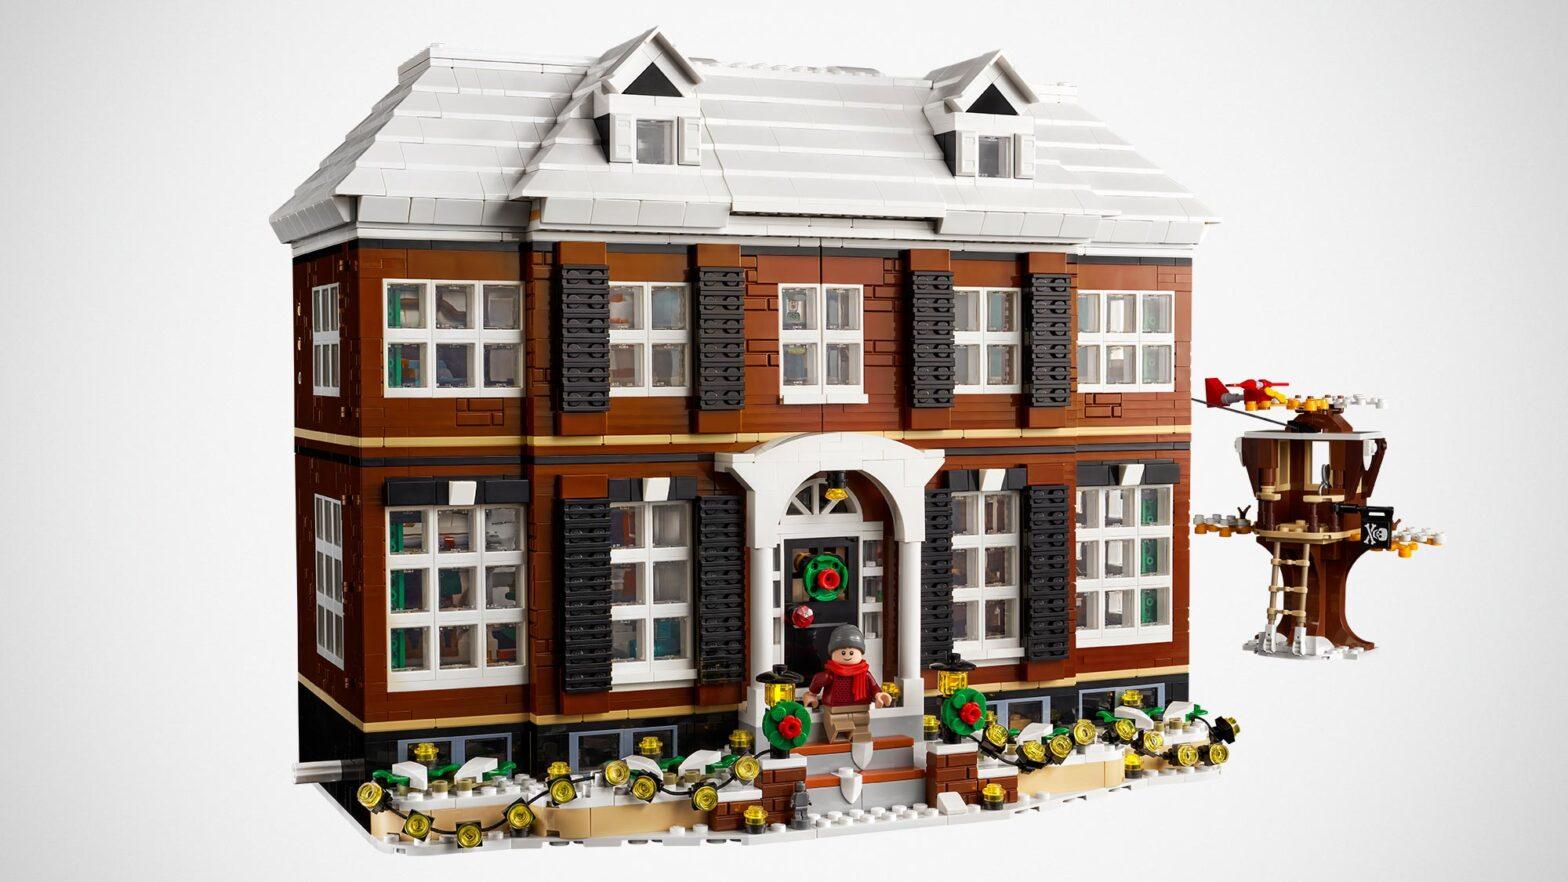 LEGO Ideas 21330 Home Alone Building Set